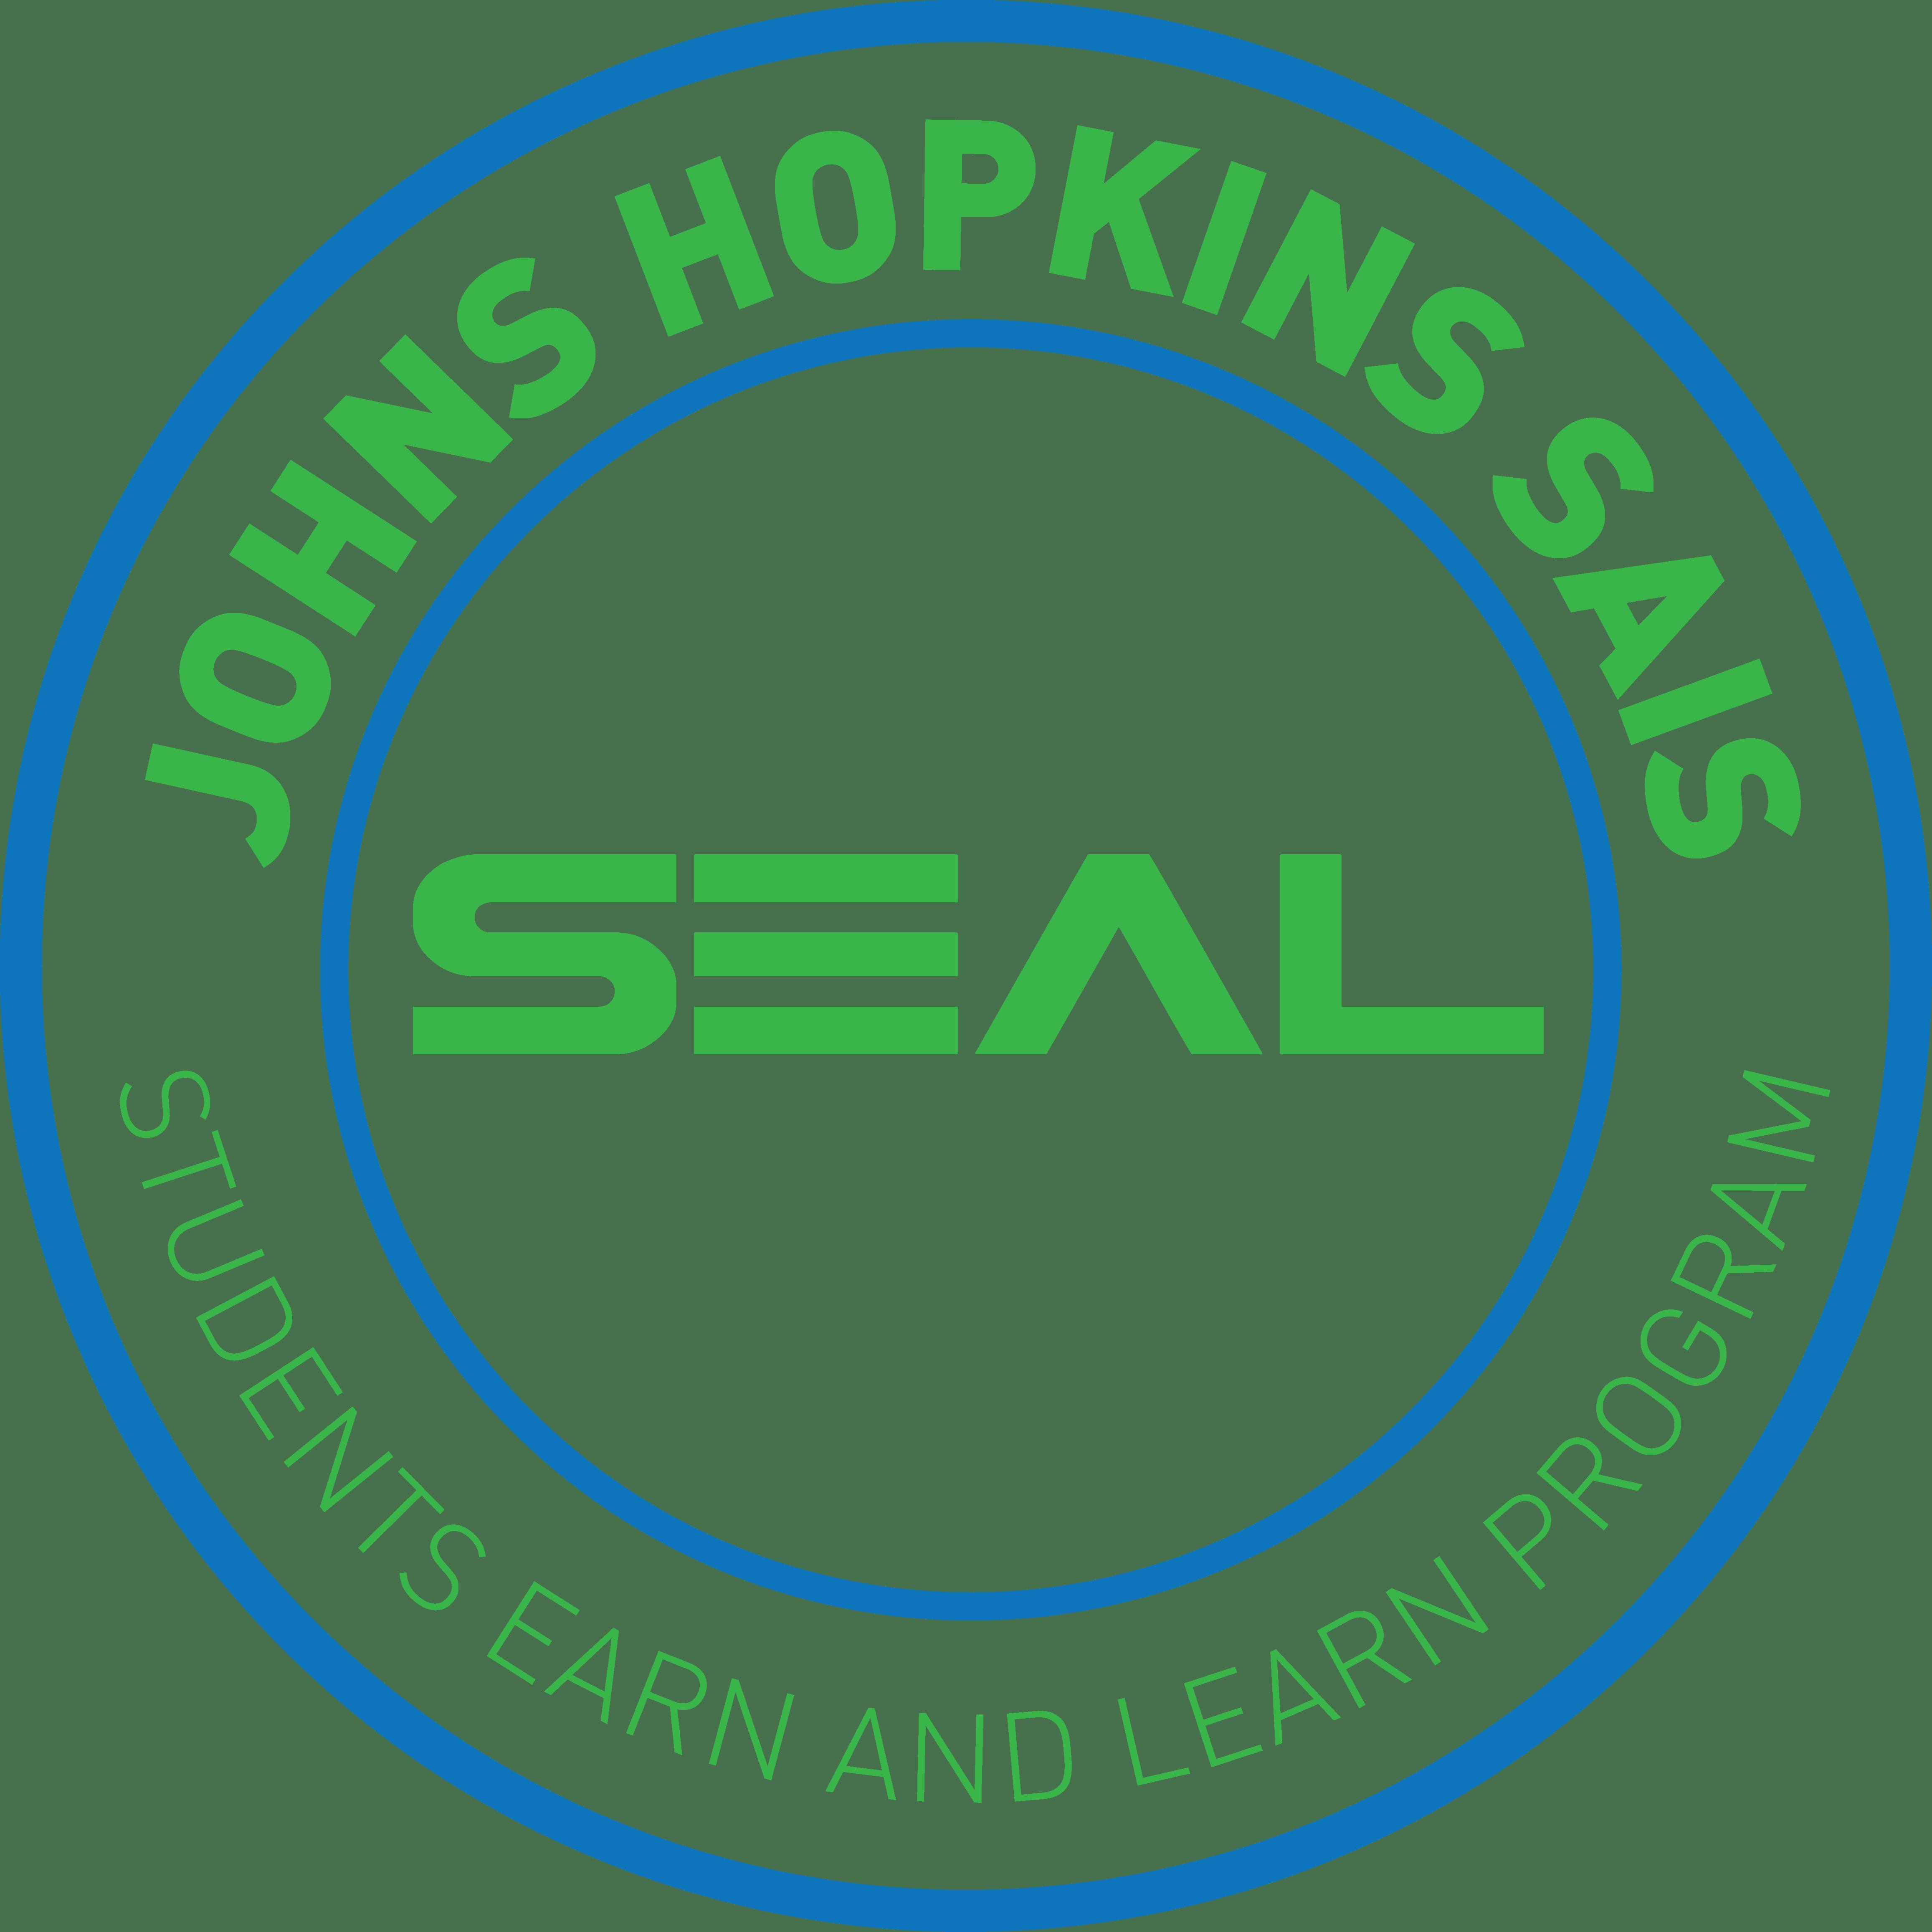 Johns Hopkins SAIS SEAL logo